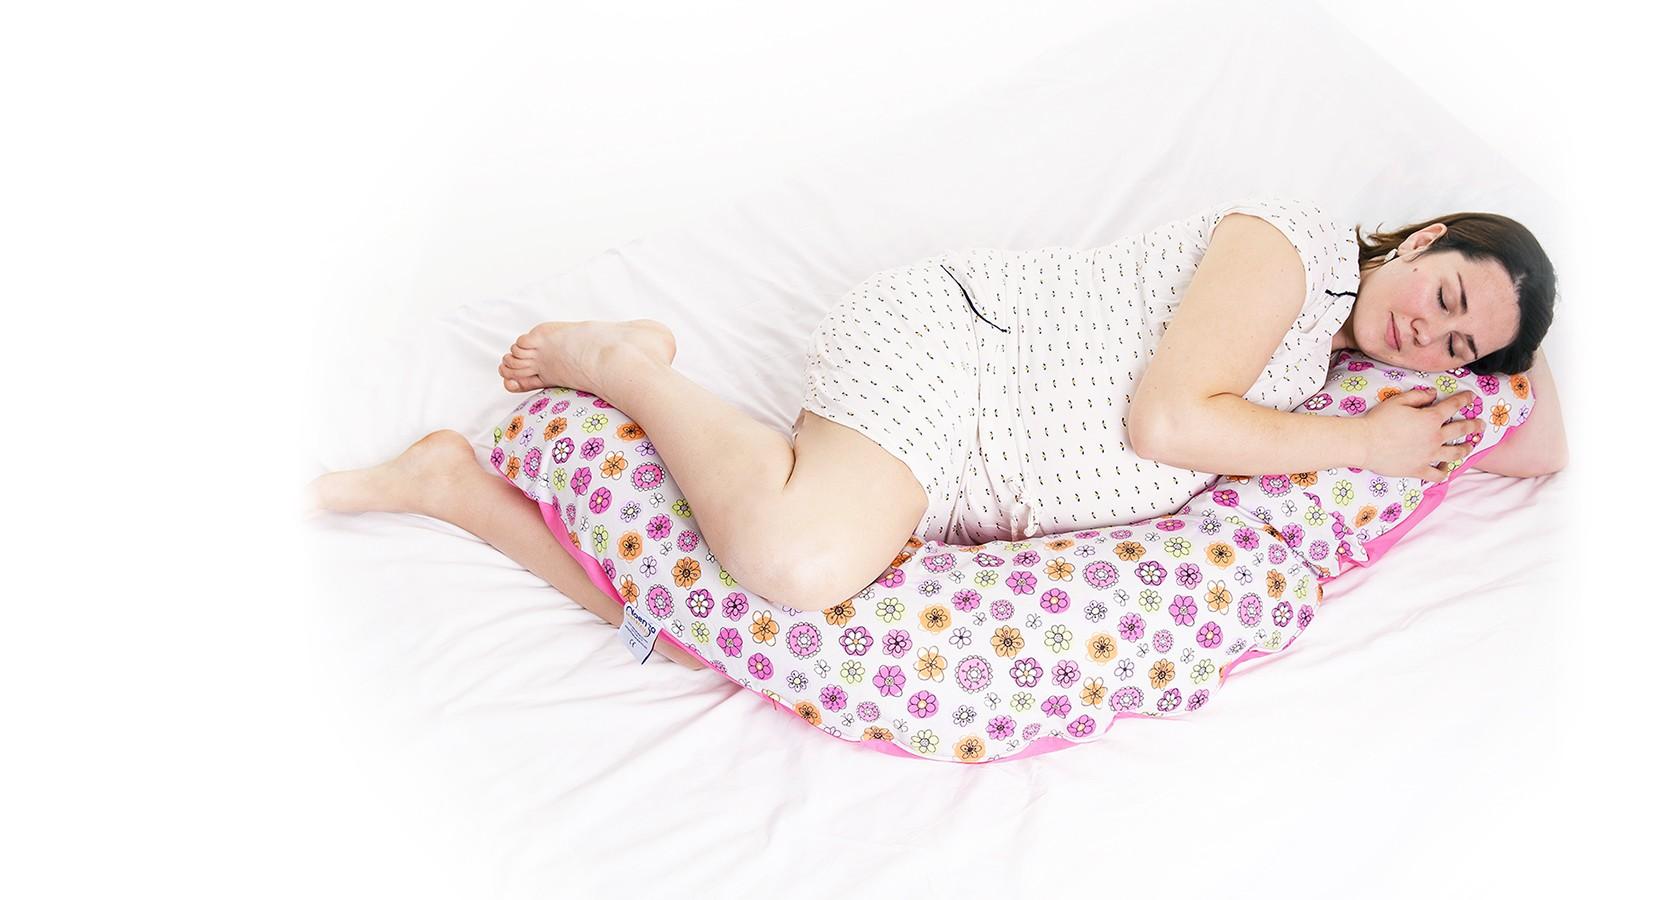 coussins d 39 allaitement made in france pour femmes enceintes sages femmes maternit s. Black Bedroom Furniture Sets. Home Design Ideas